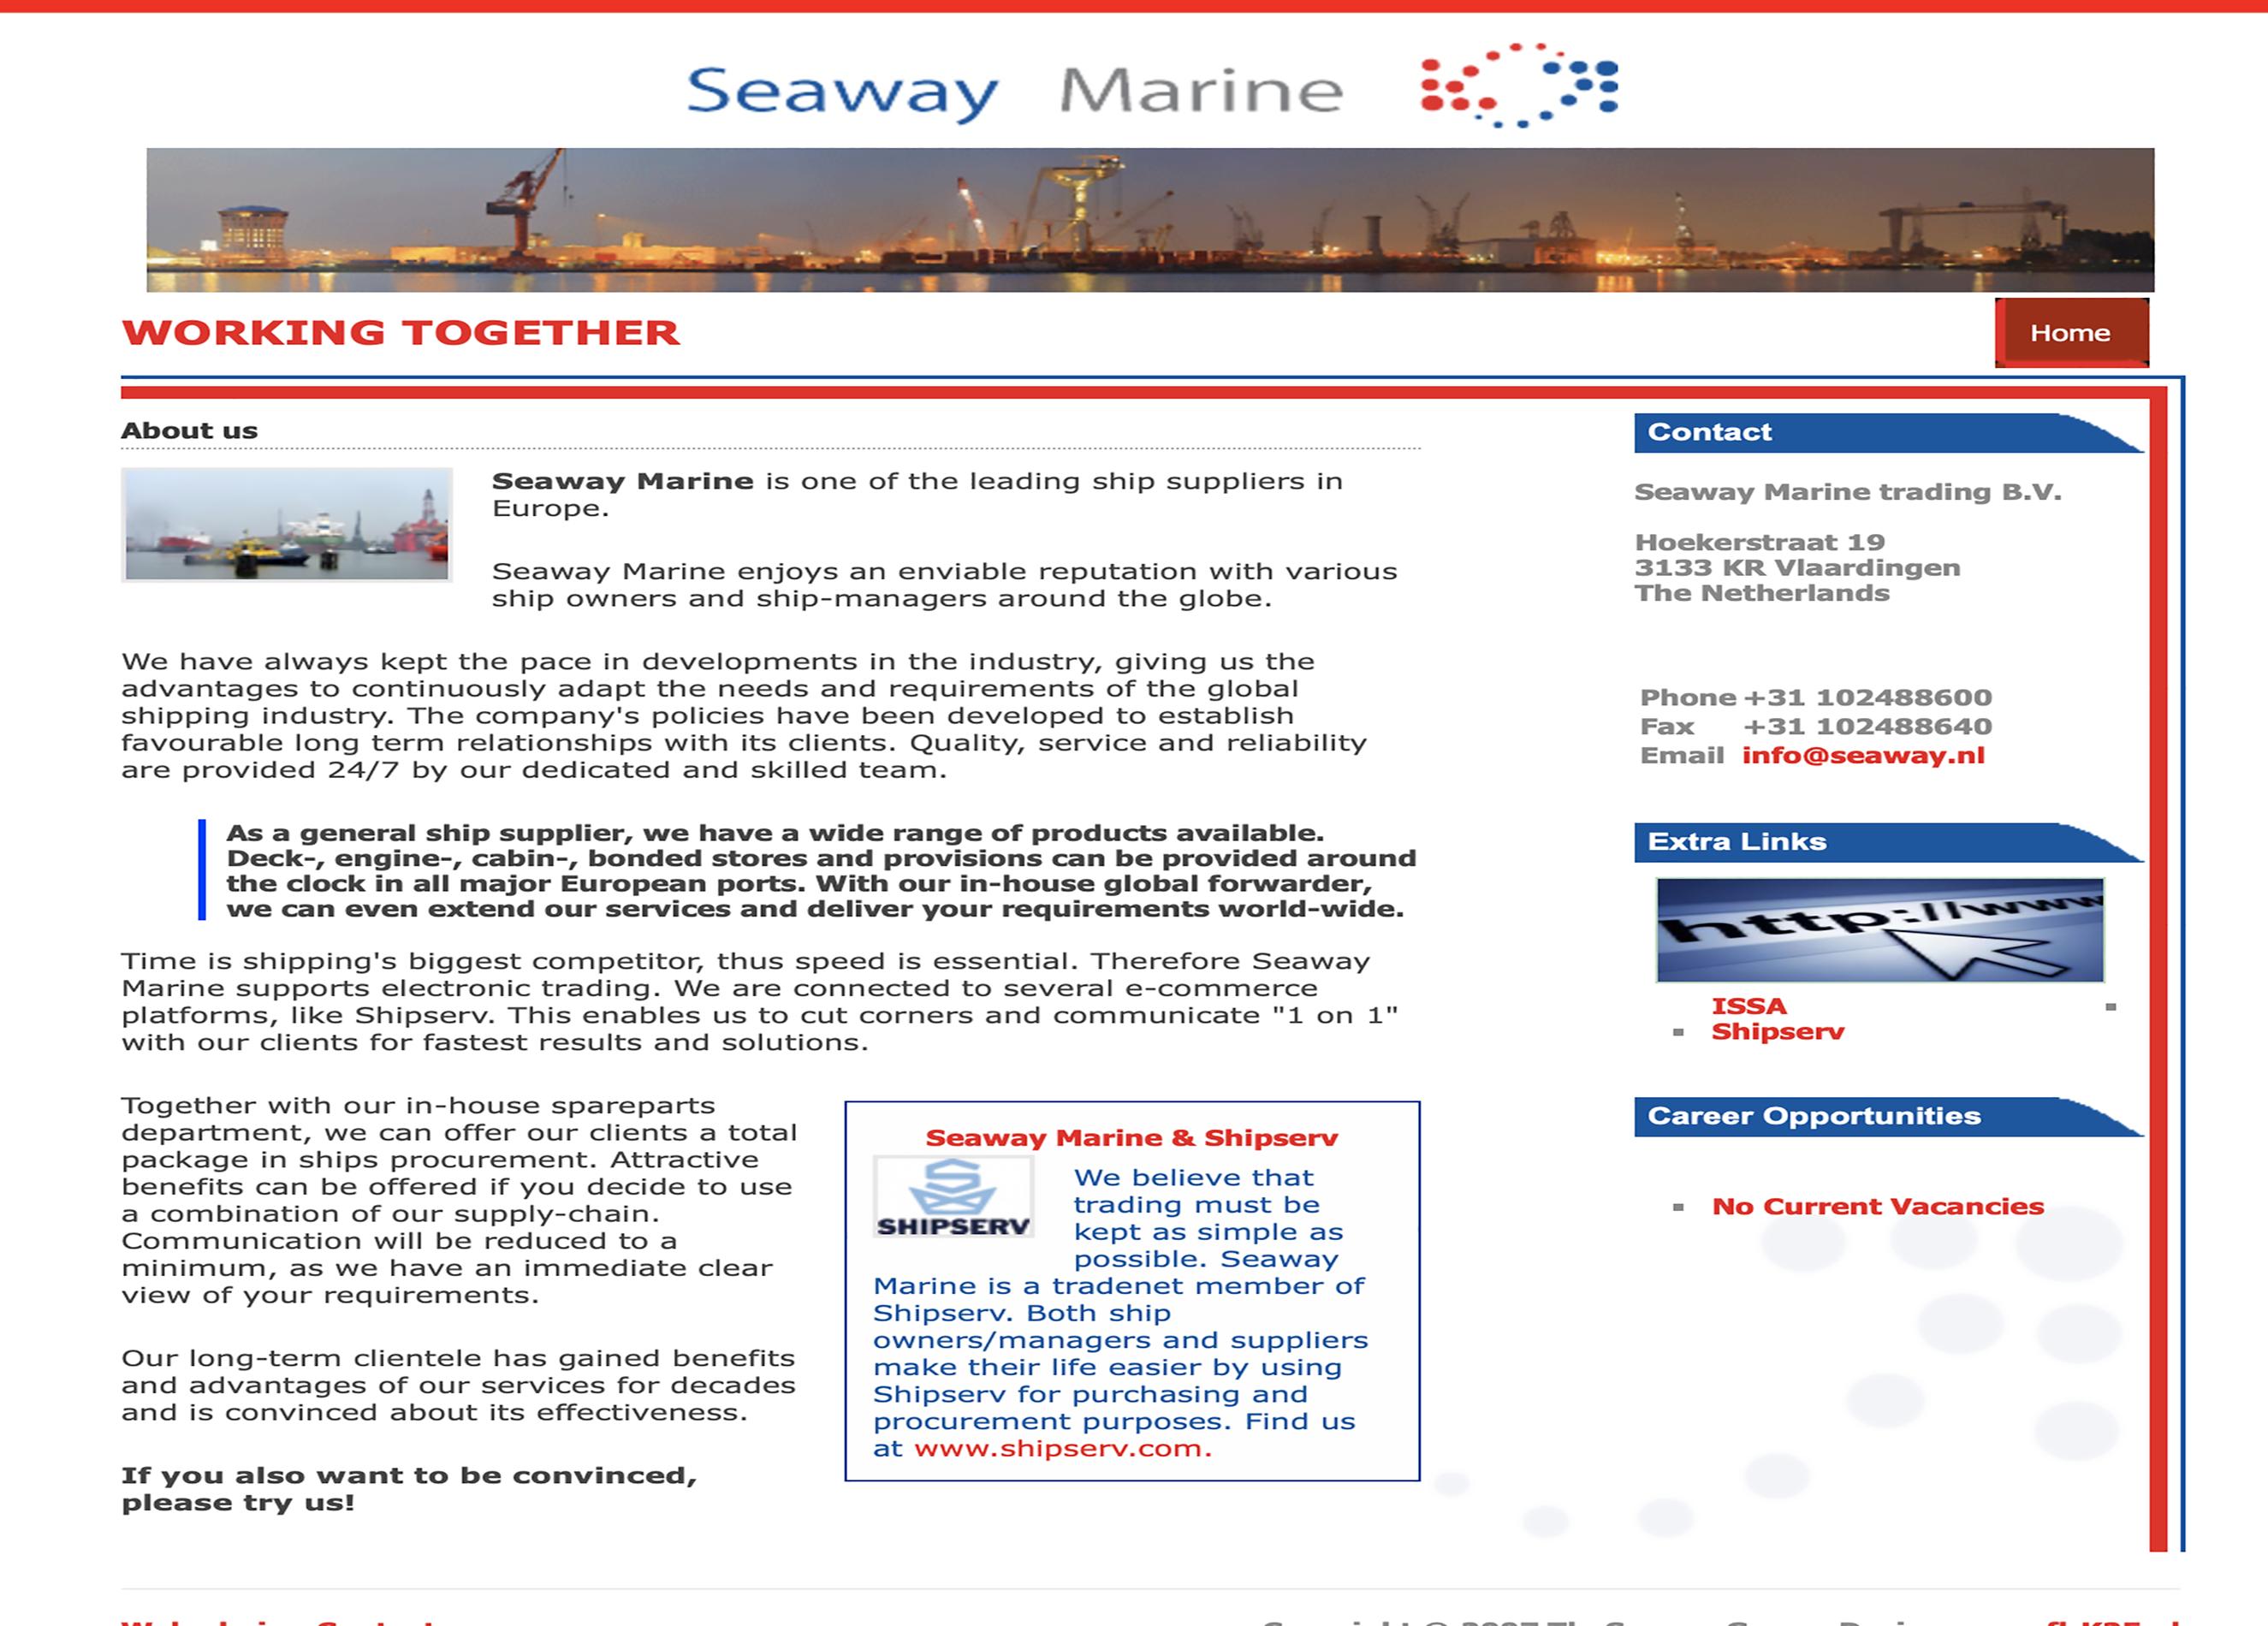 Seaway marine trading